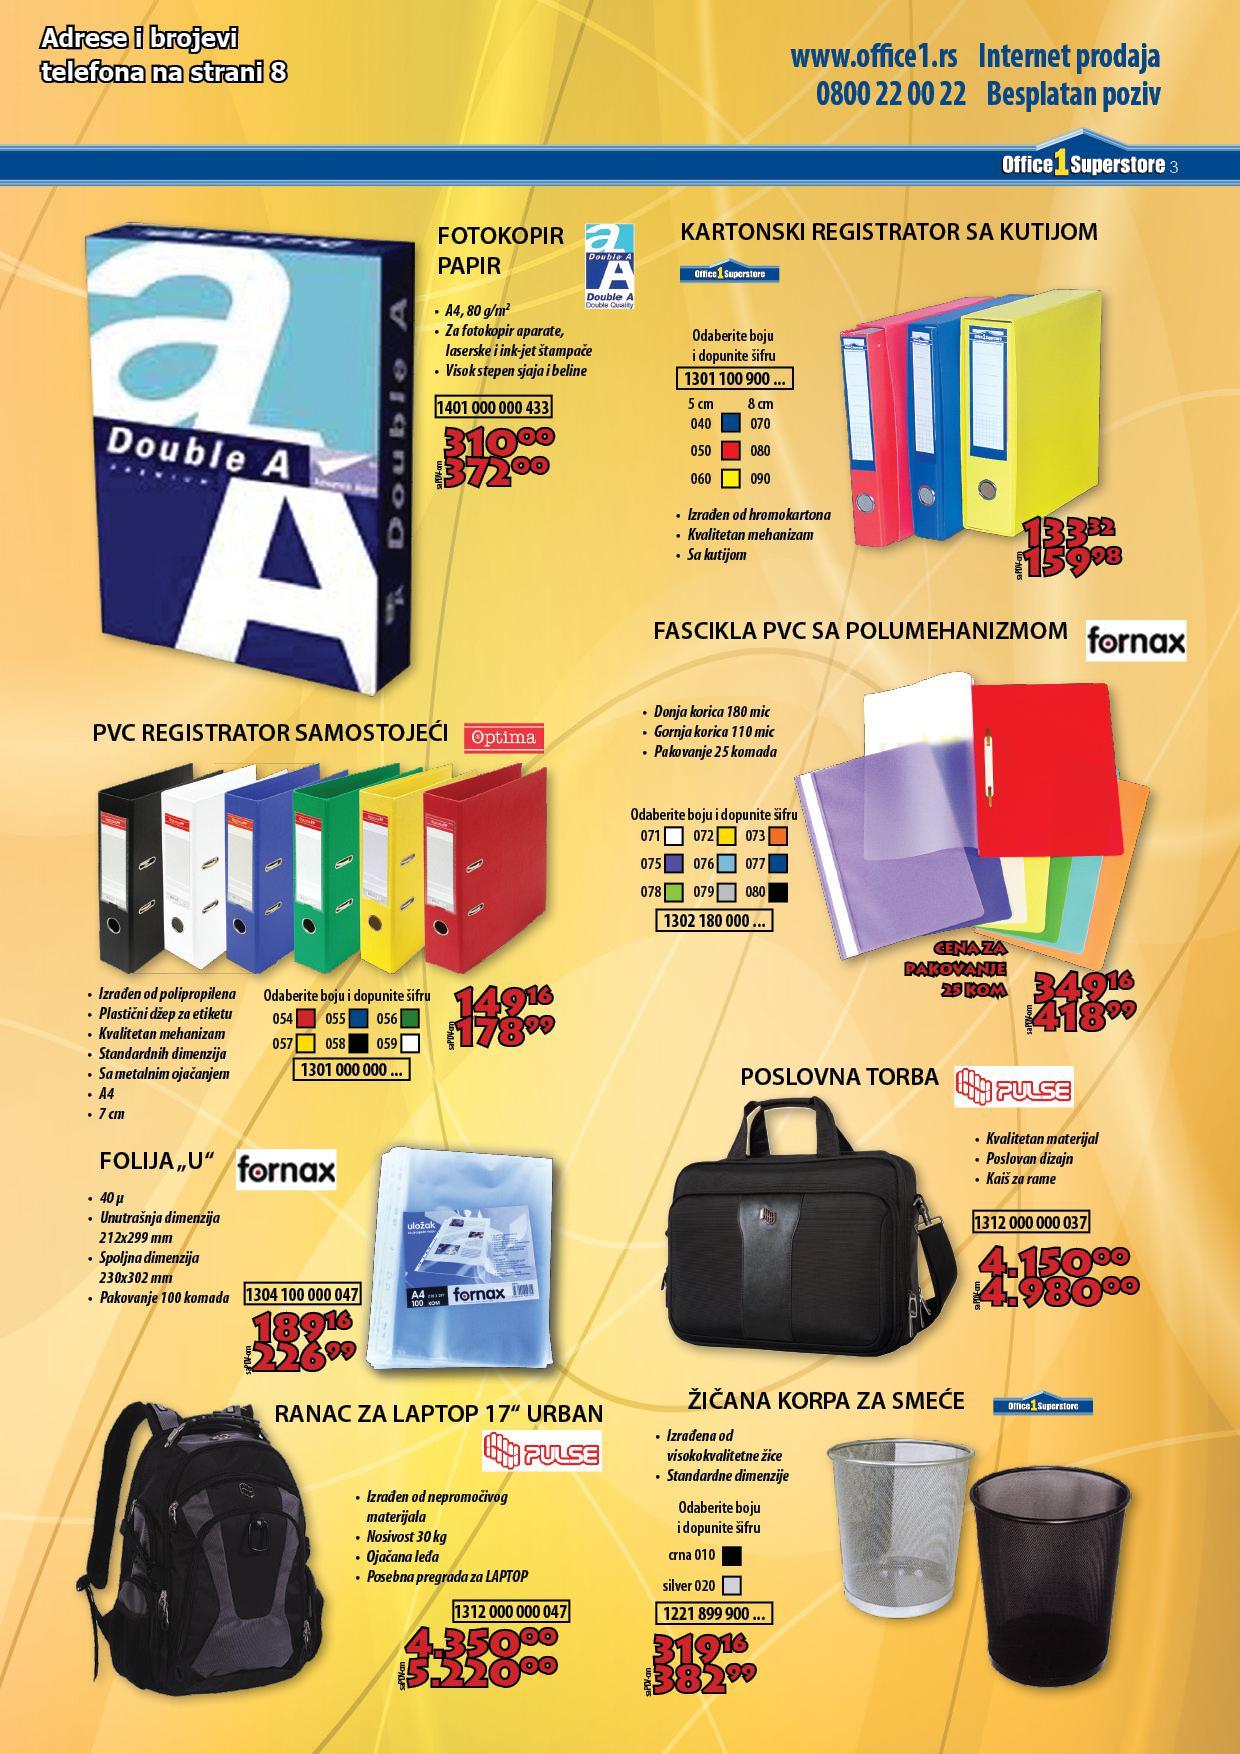 Office1 superstore akcija super cena